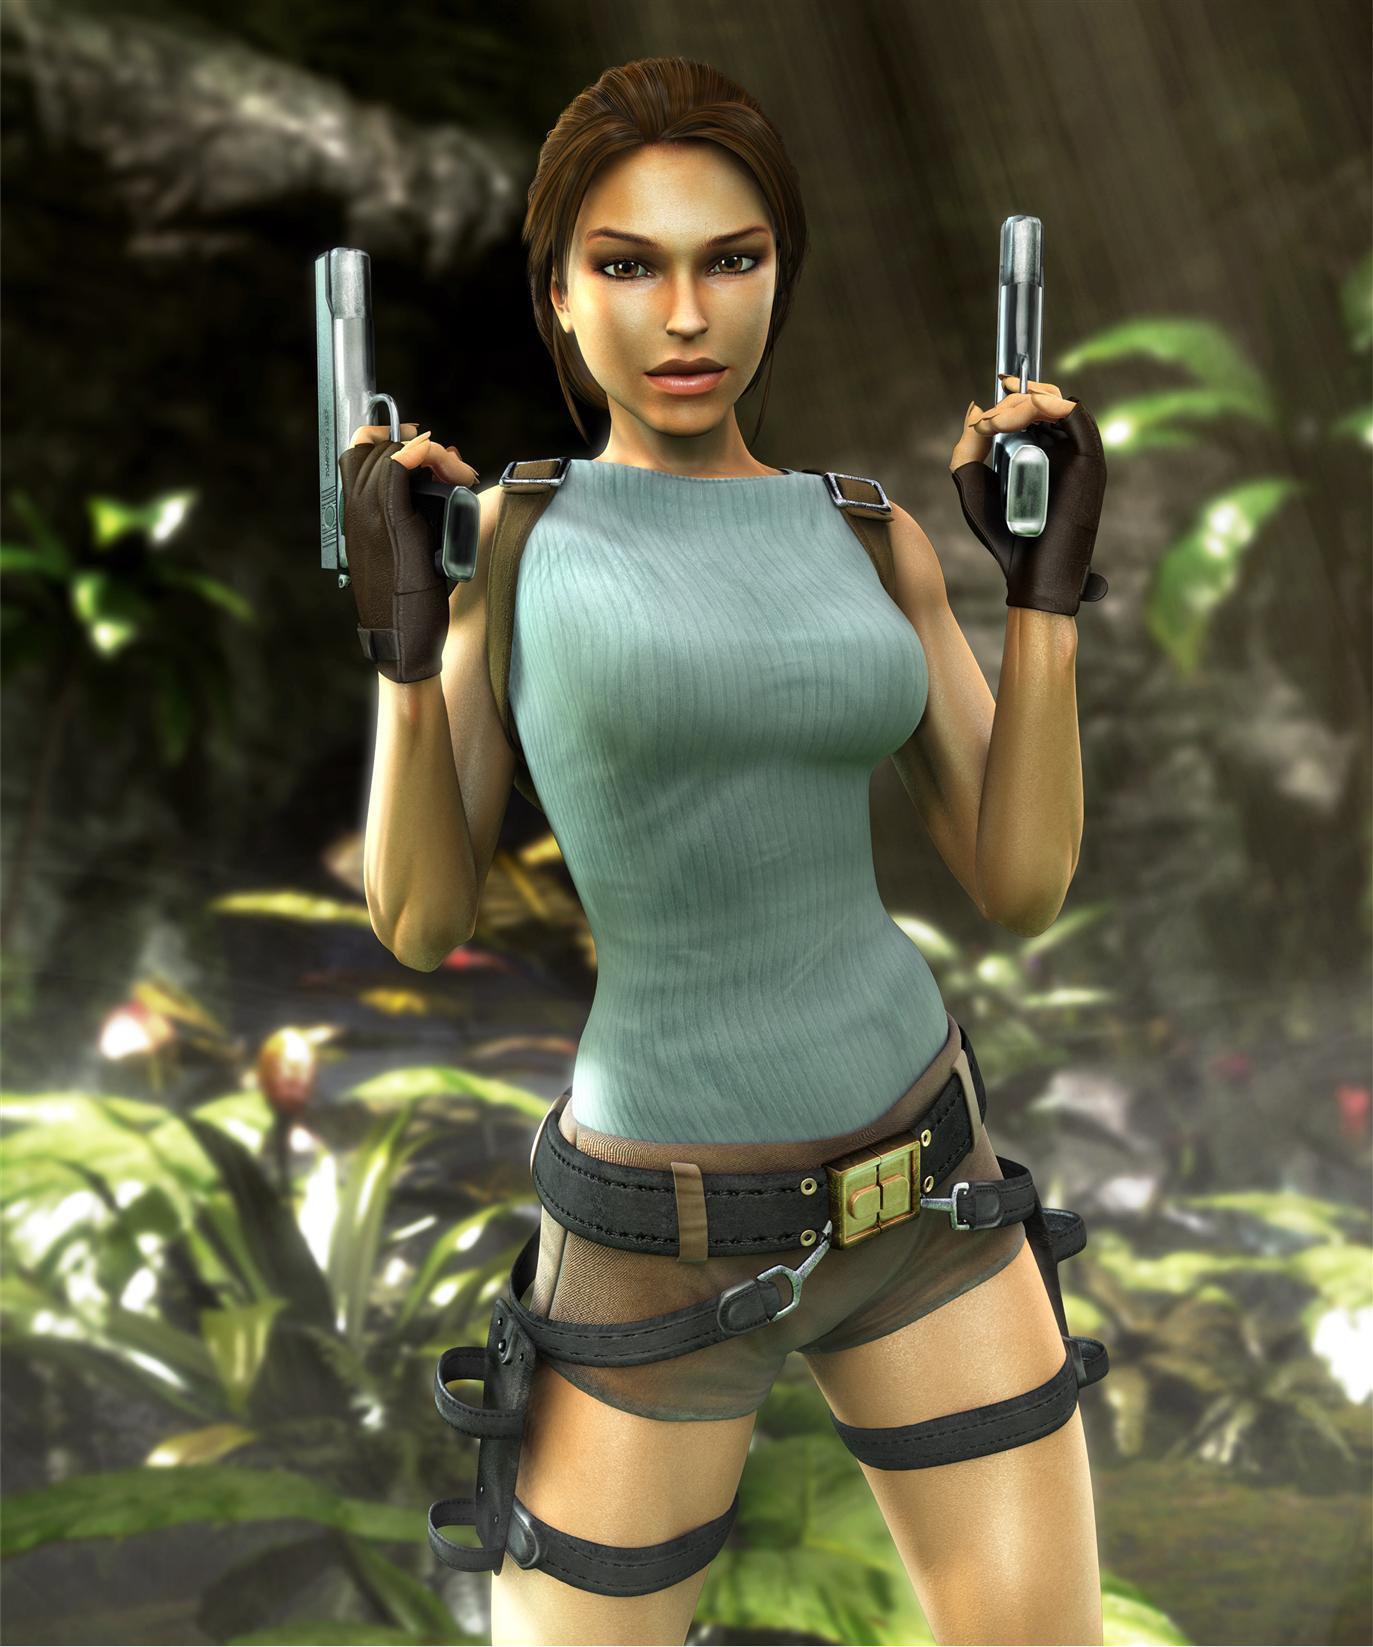 Lara craft photos nude galeries xxx image